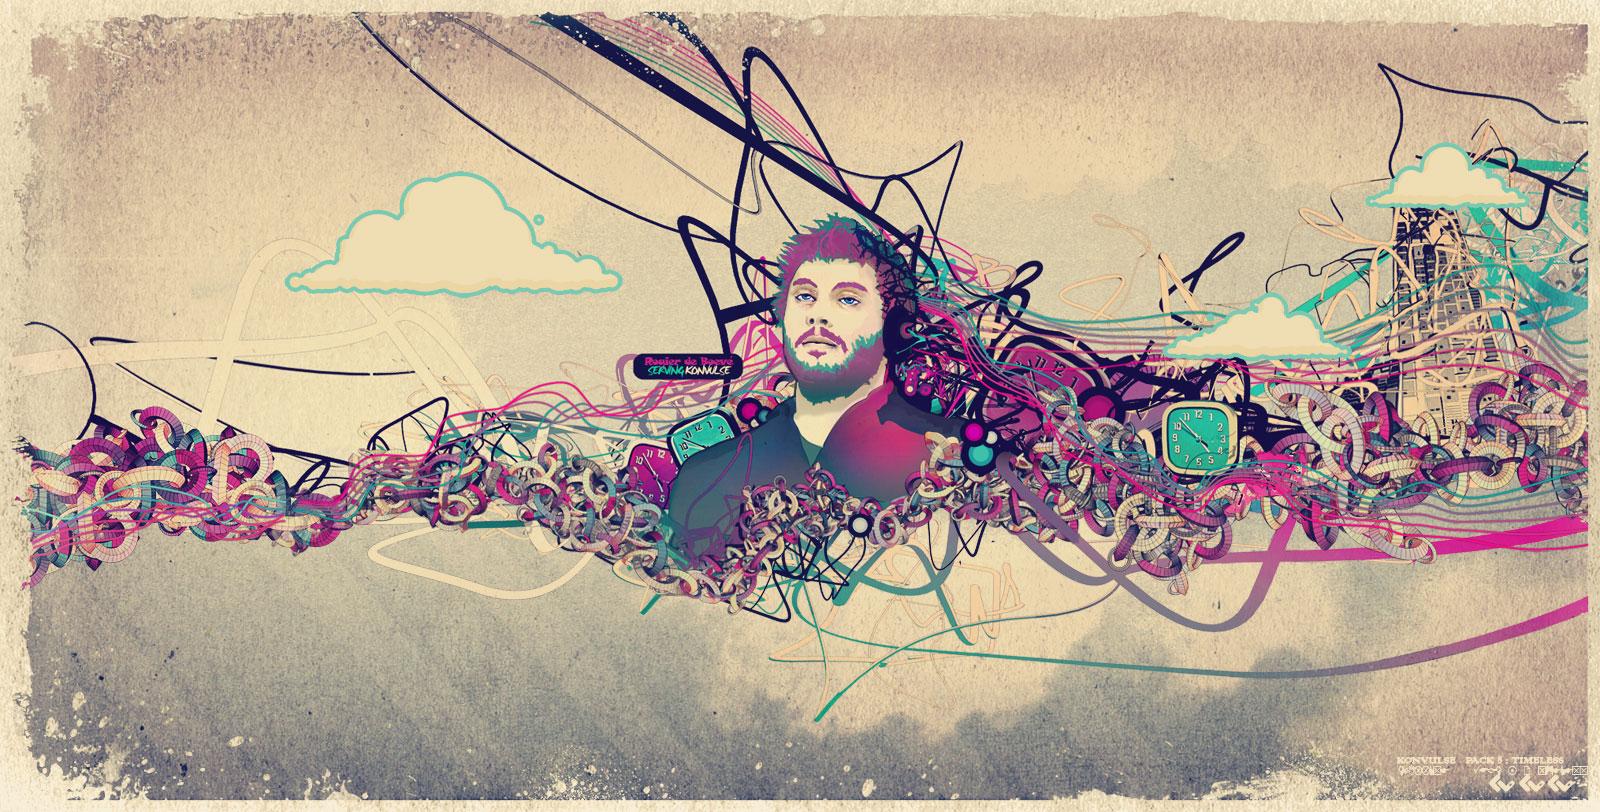 amazing-graphic-design-works-by-rogier-de-boeve-5